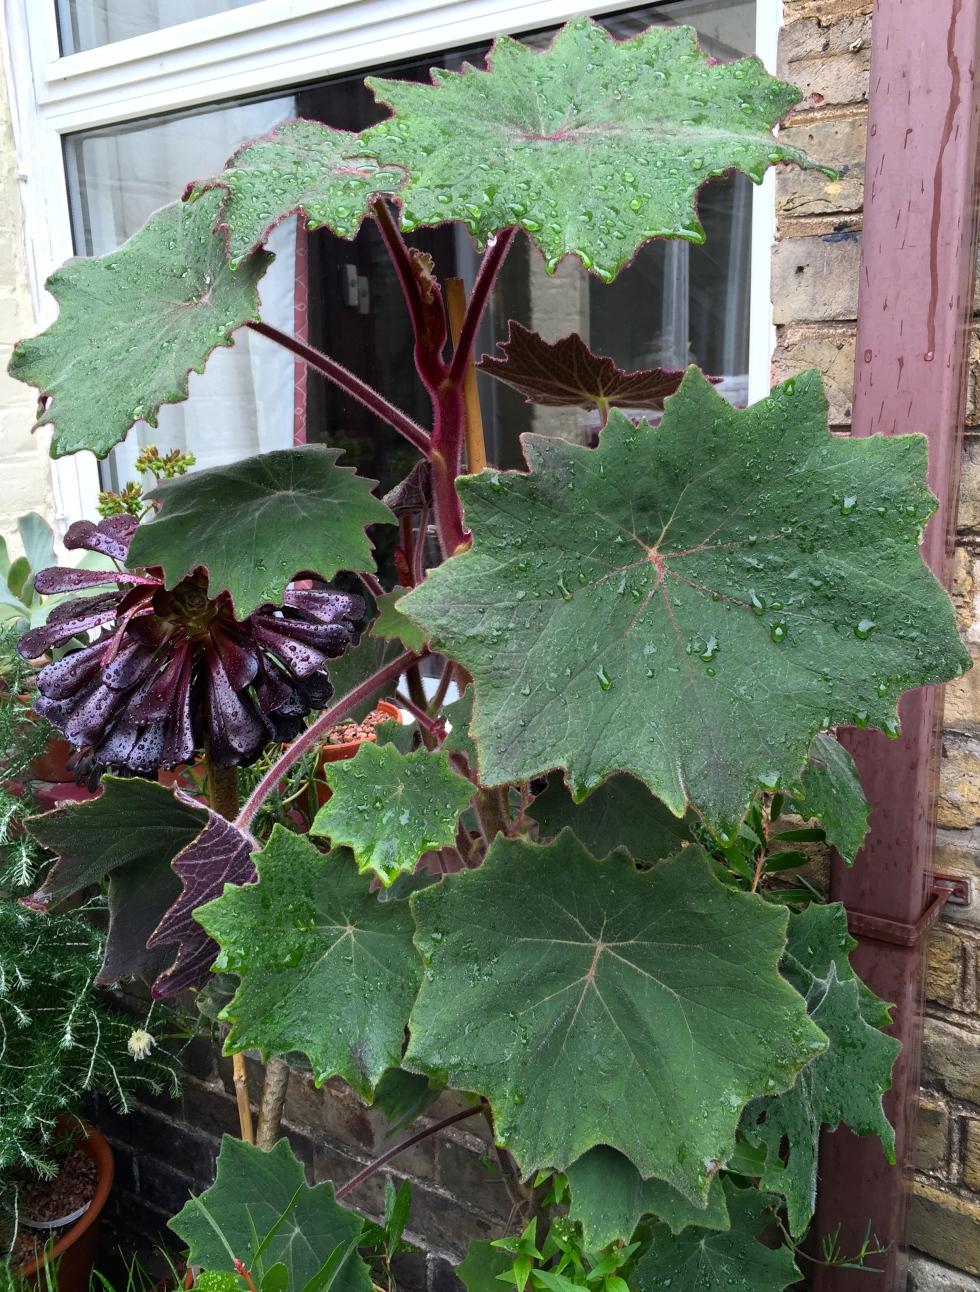 Senecio cristobalensis just grows and grows and grows....